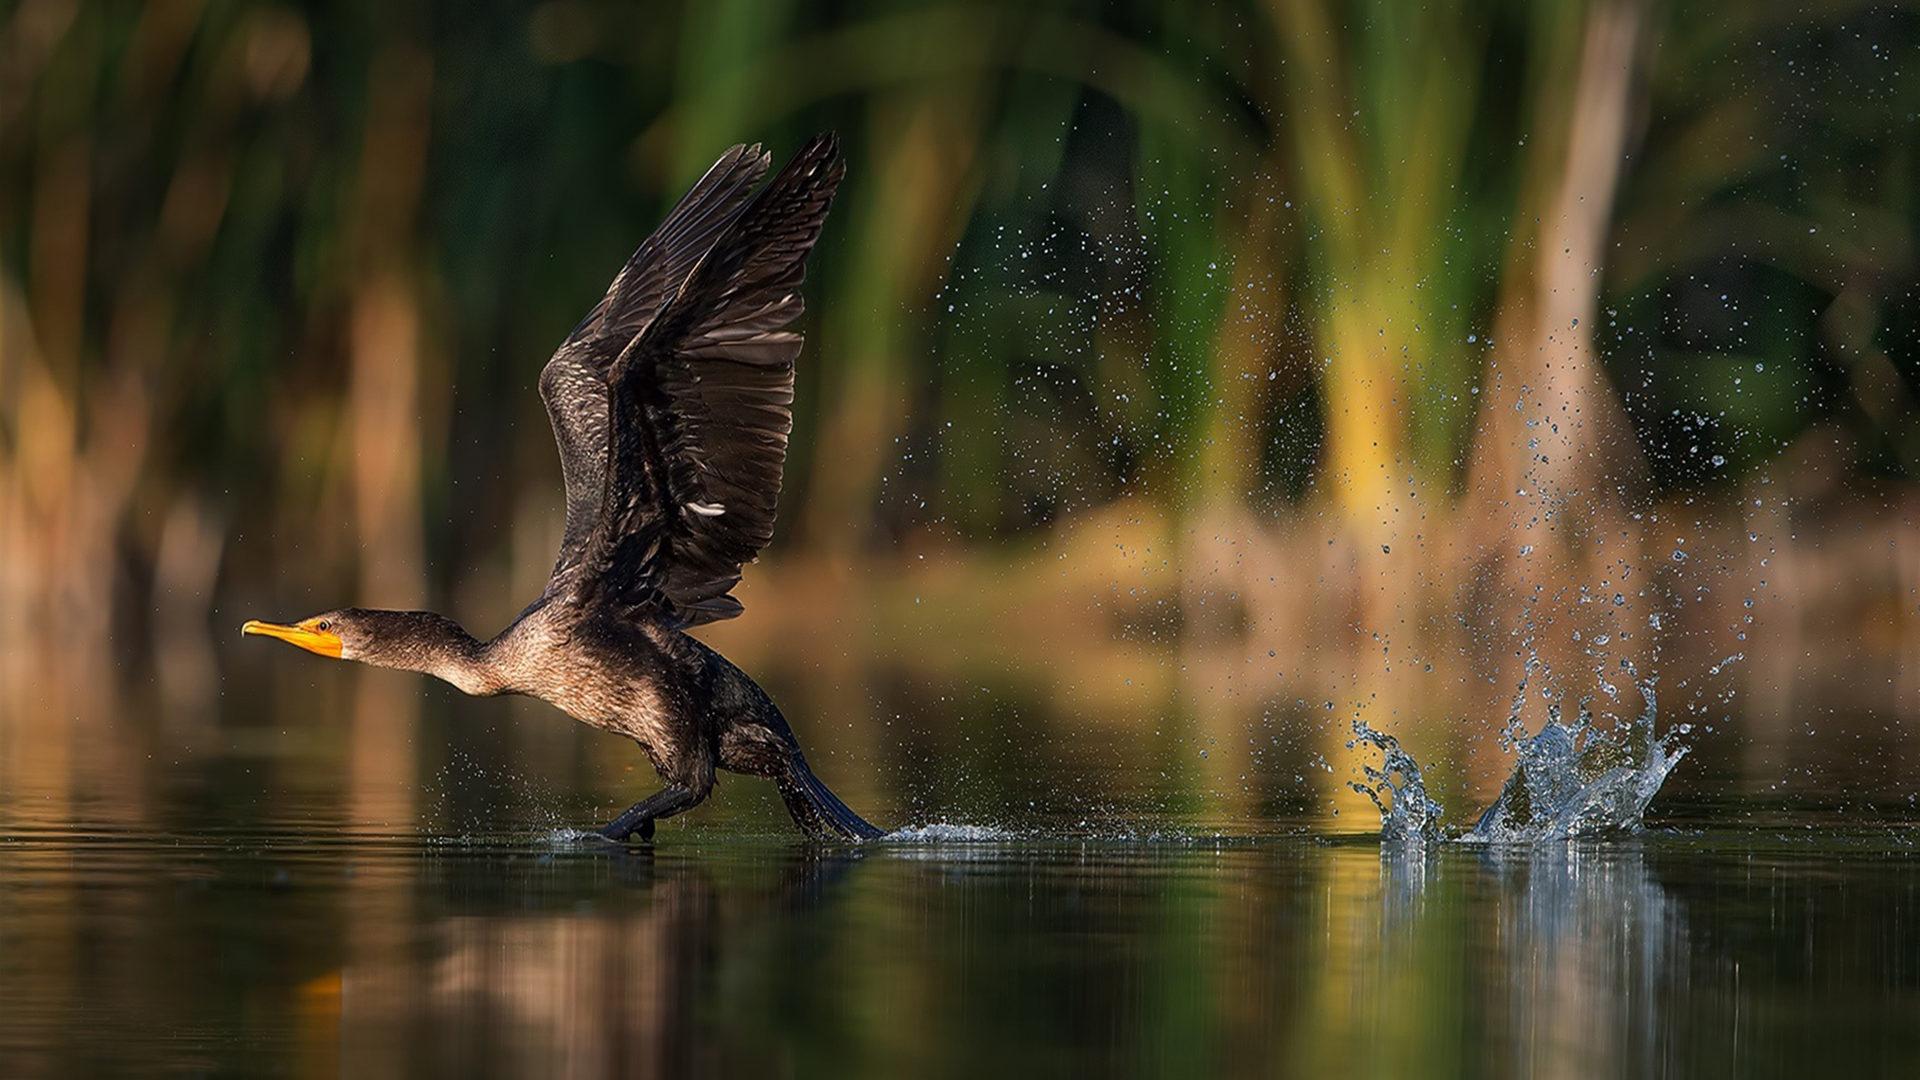 Camouflage Iphone Wallpaper Cormorant Bird Taking Off From Lake Water Desktop